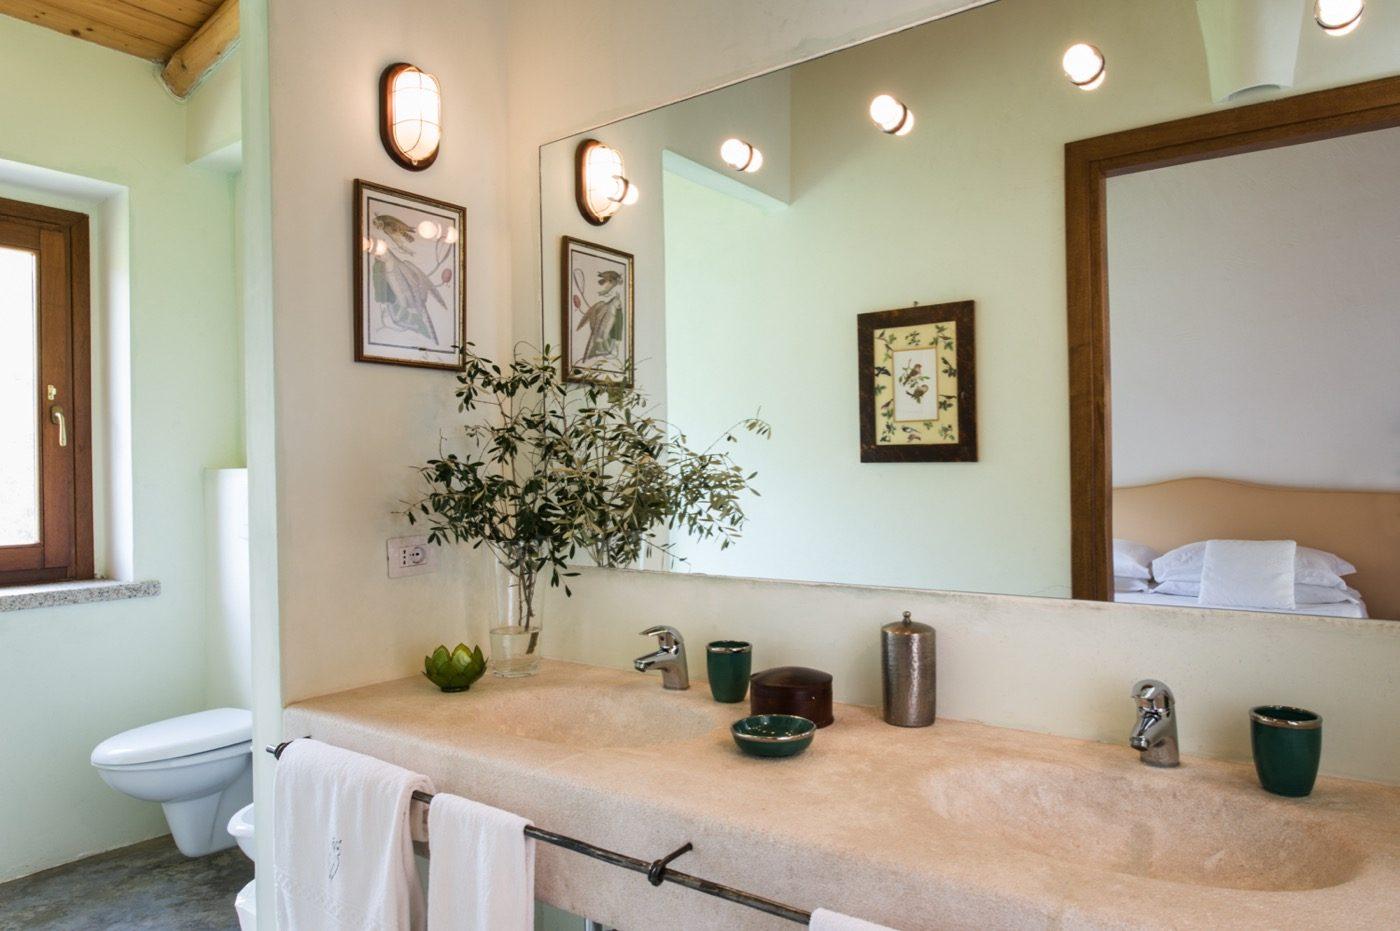 bagno guest house villa sardegna cambi aste